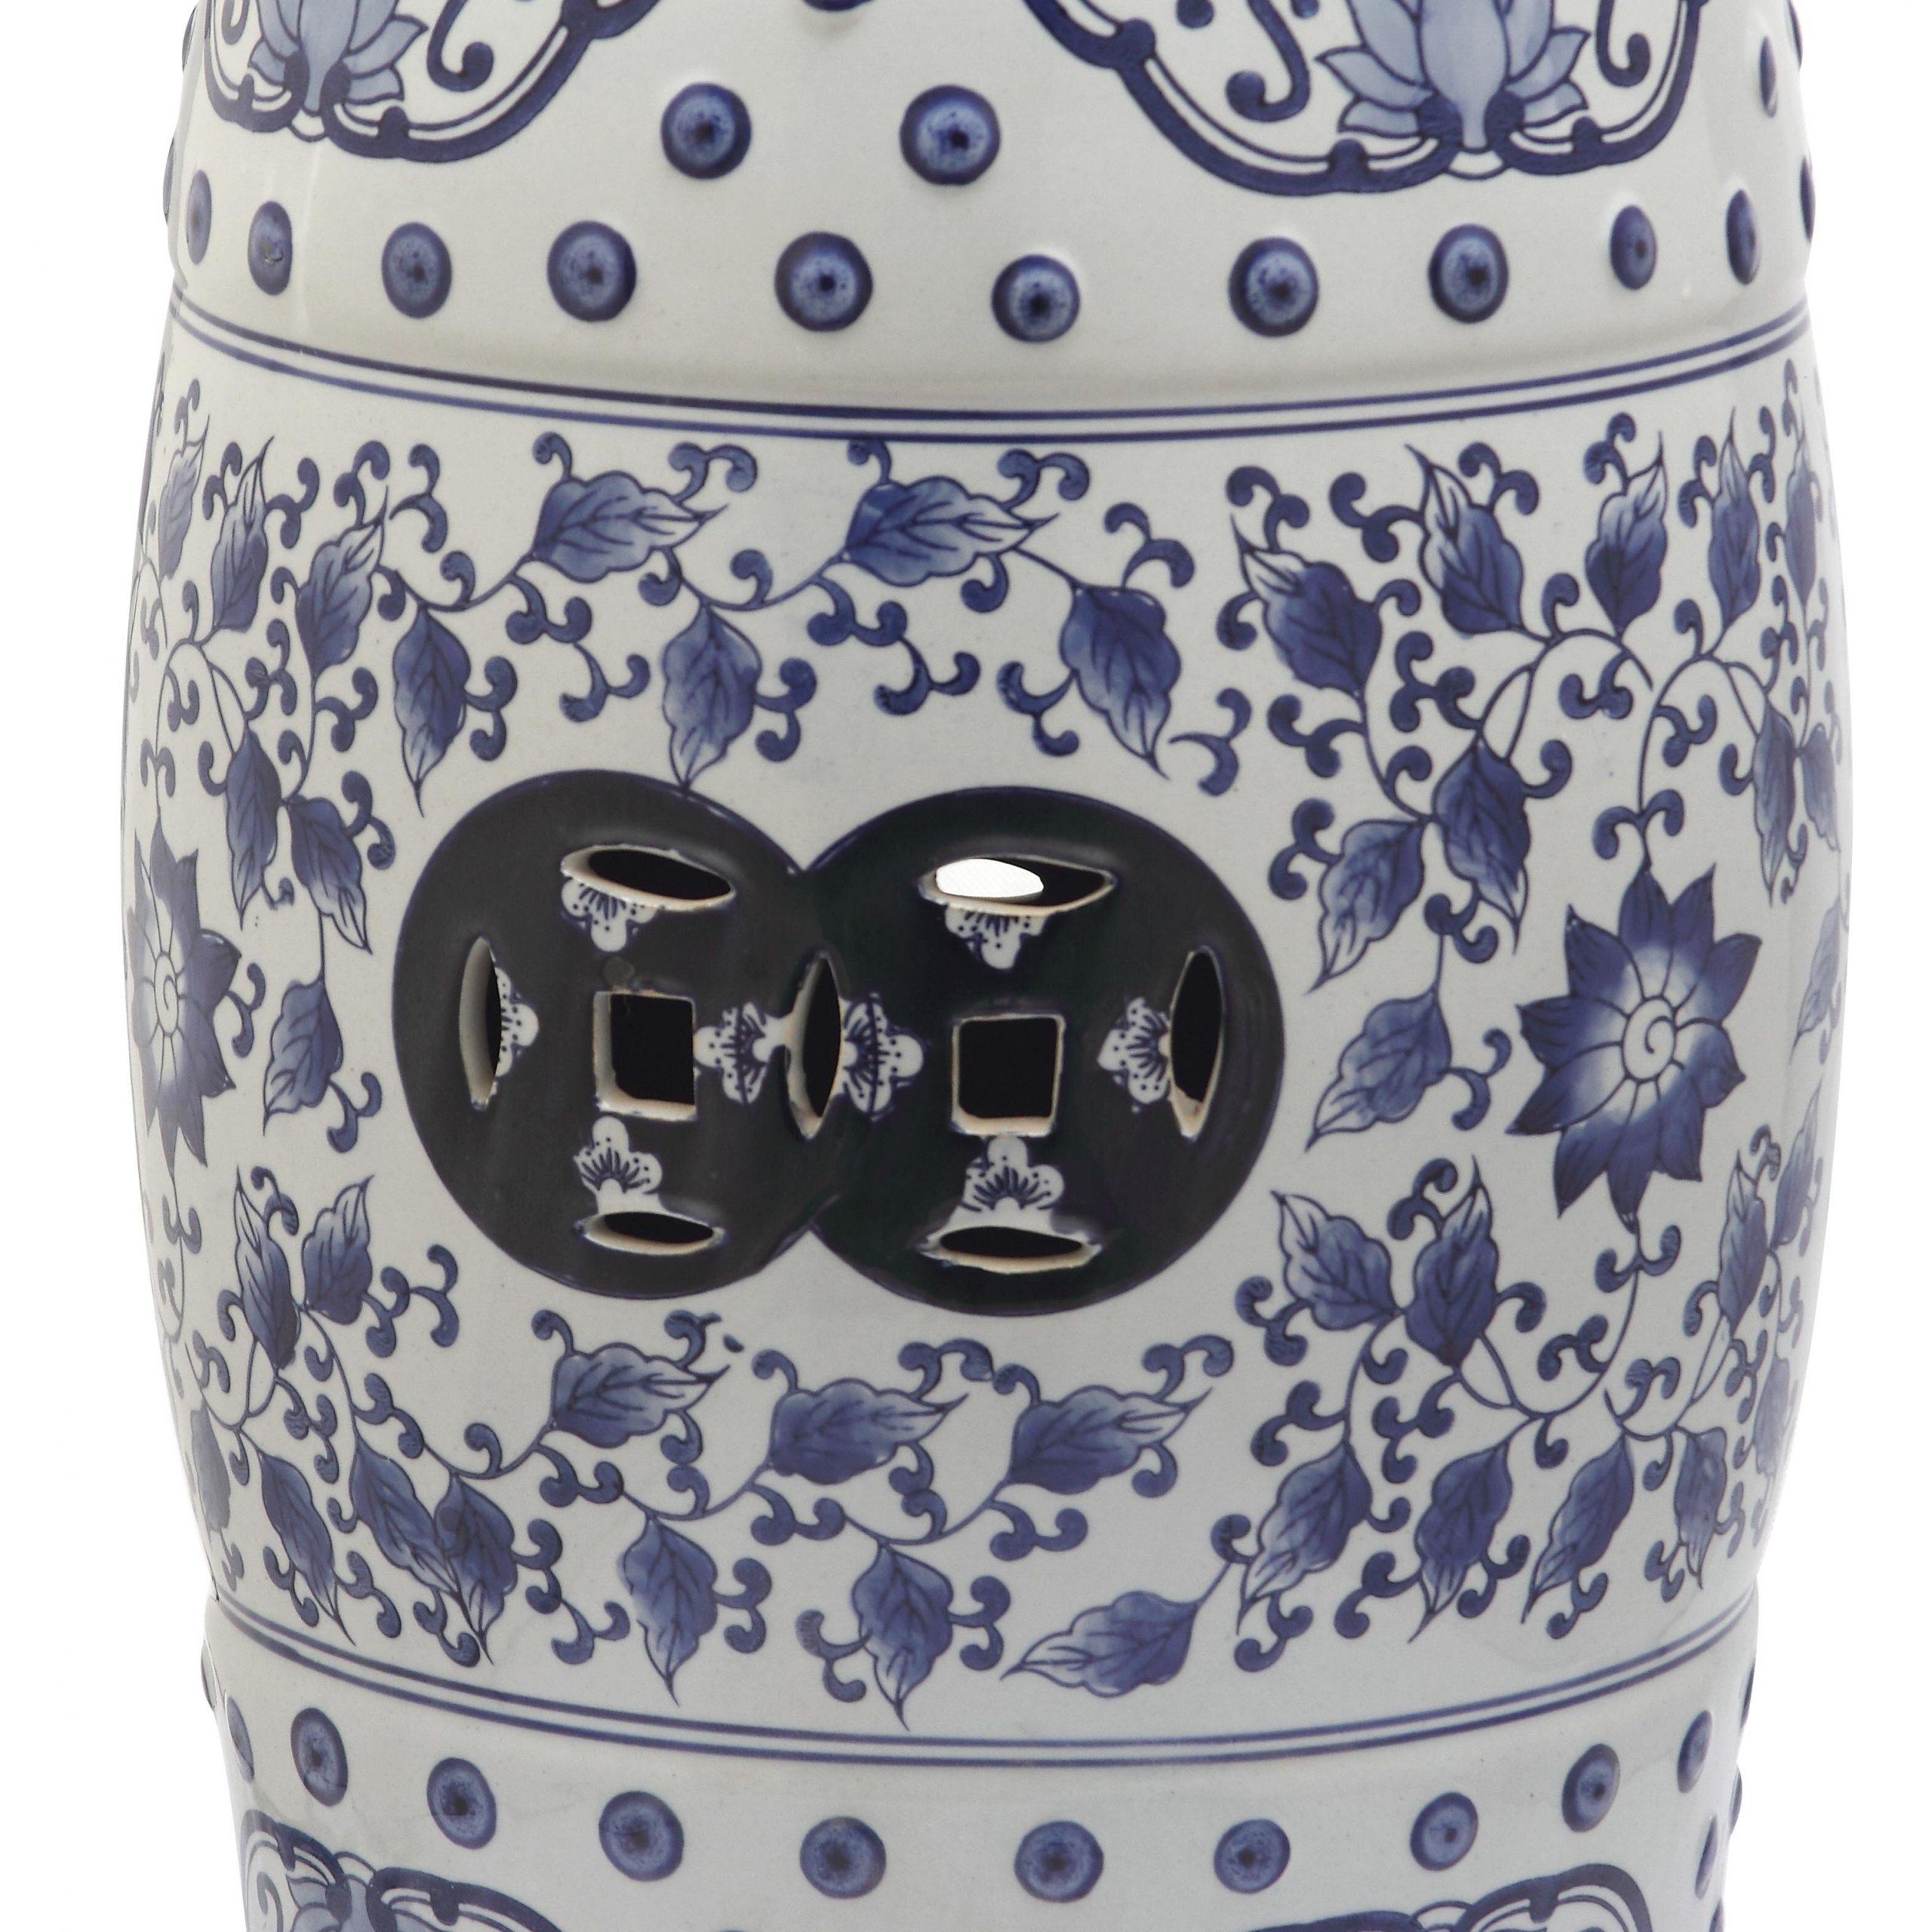 Murphy Ceramic Garden Stool With Regard To Winterview Garden Stools (View 16 of 25)